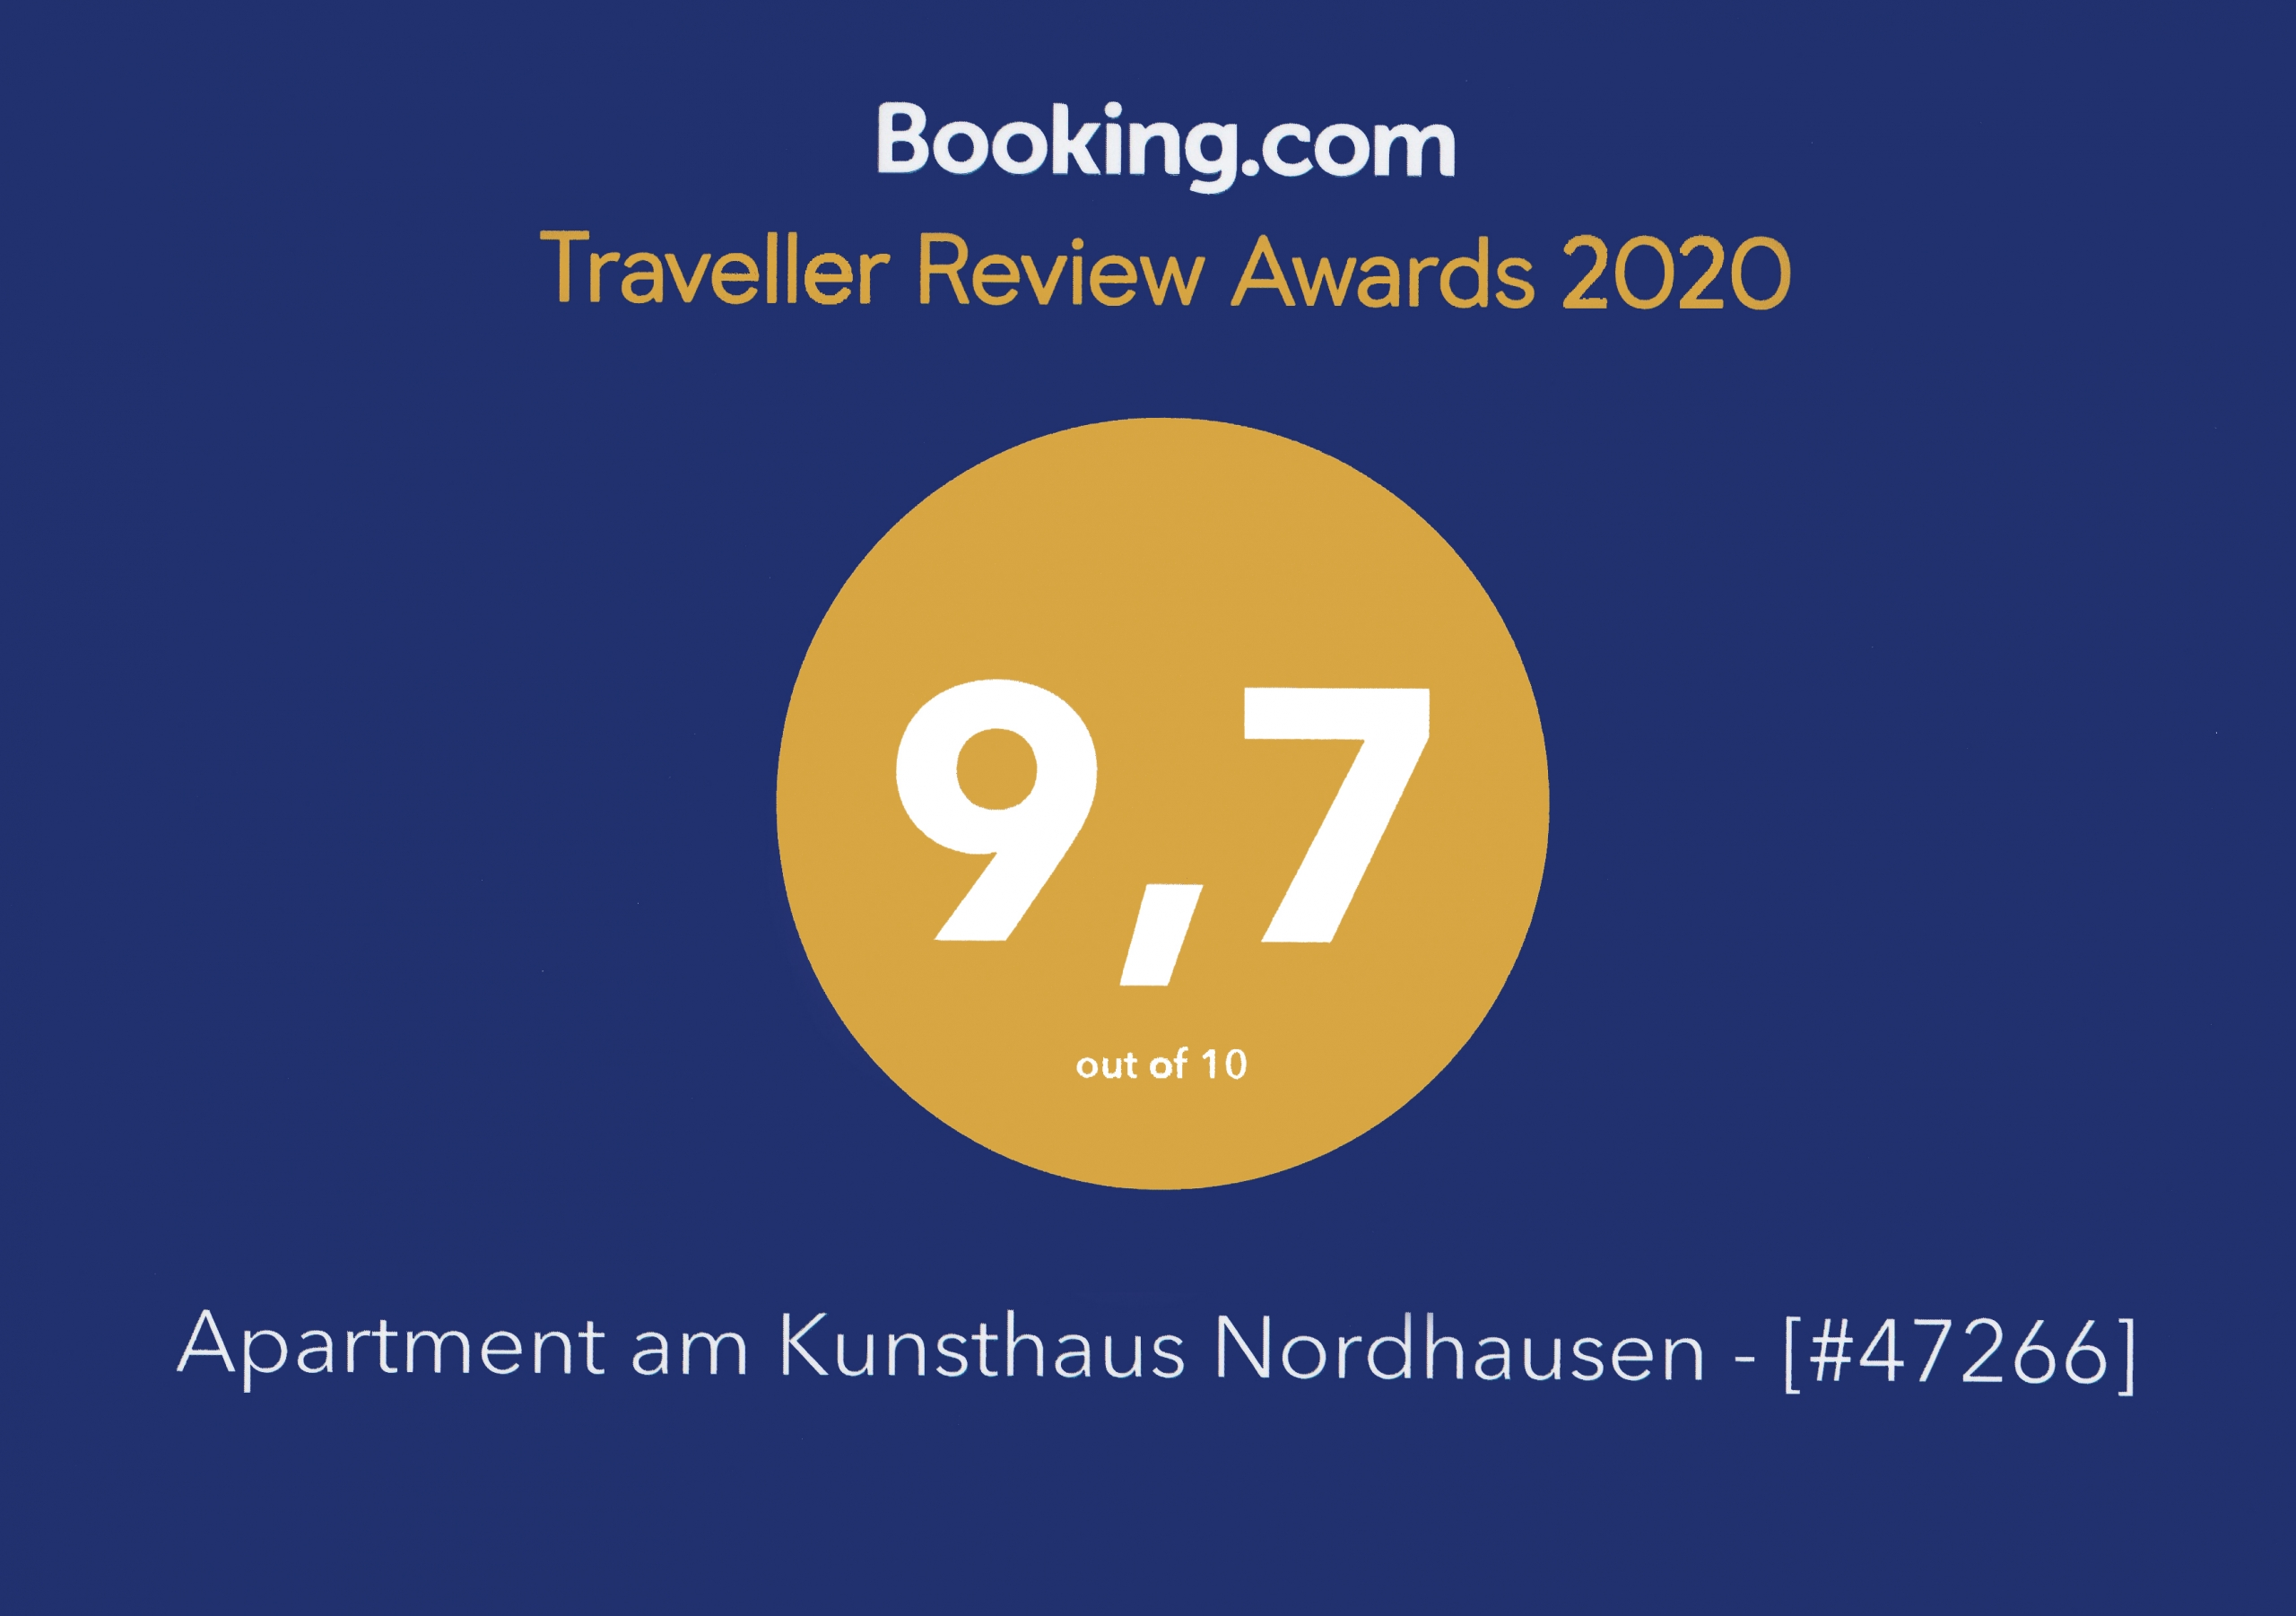 Booking.com Award - Ferienwohnung & Apartment Kunsthaus Nordhausen